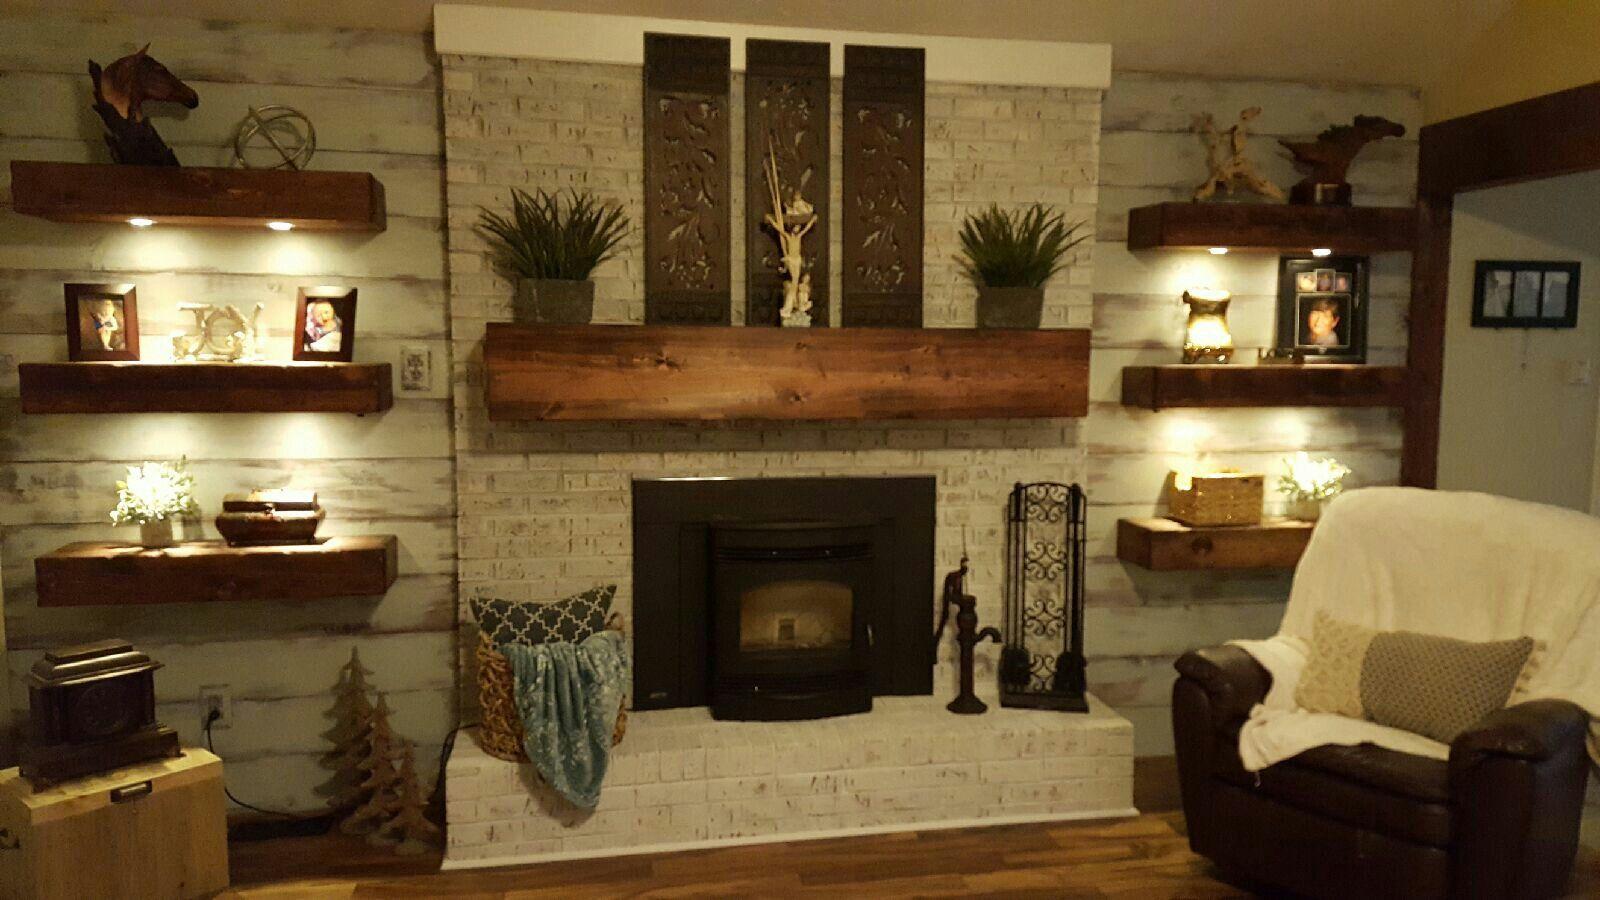 Wooden Floating Shelves Adli Kullanicinin Salon Panosundaki Pin Somine Mobilya Oturma Odasi